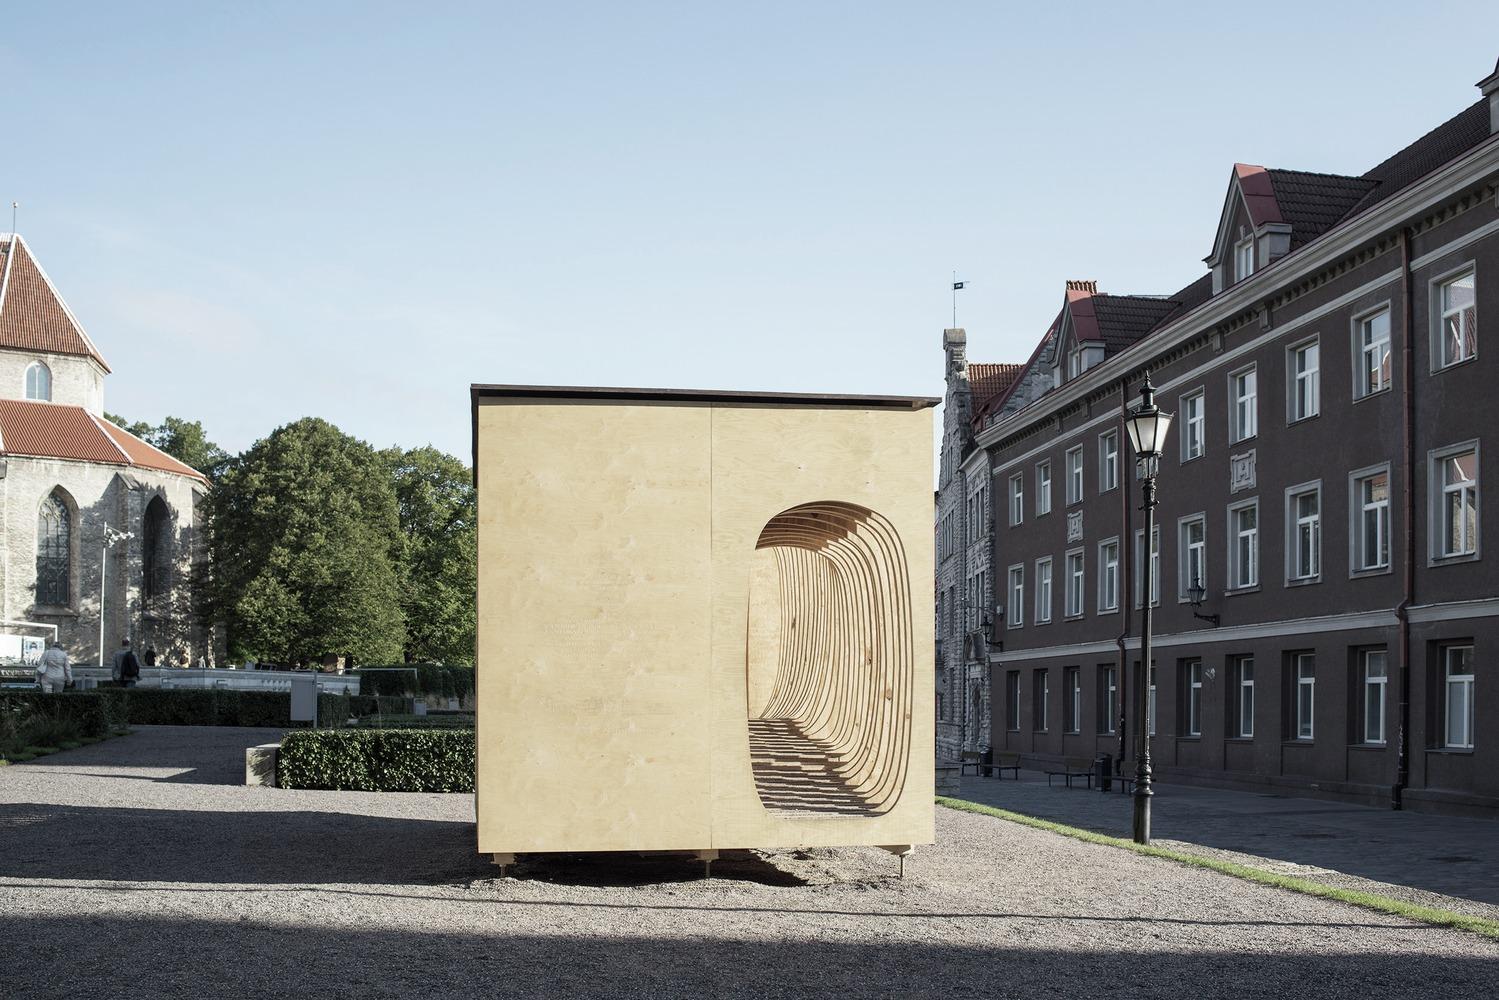 architecture_readershelter_estonia_-estonianacademyof-arts1